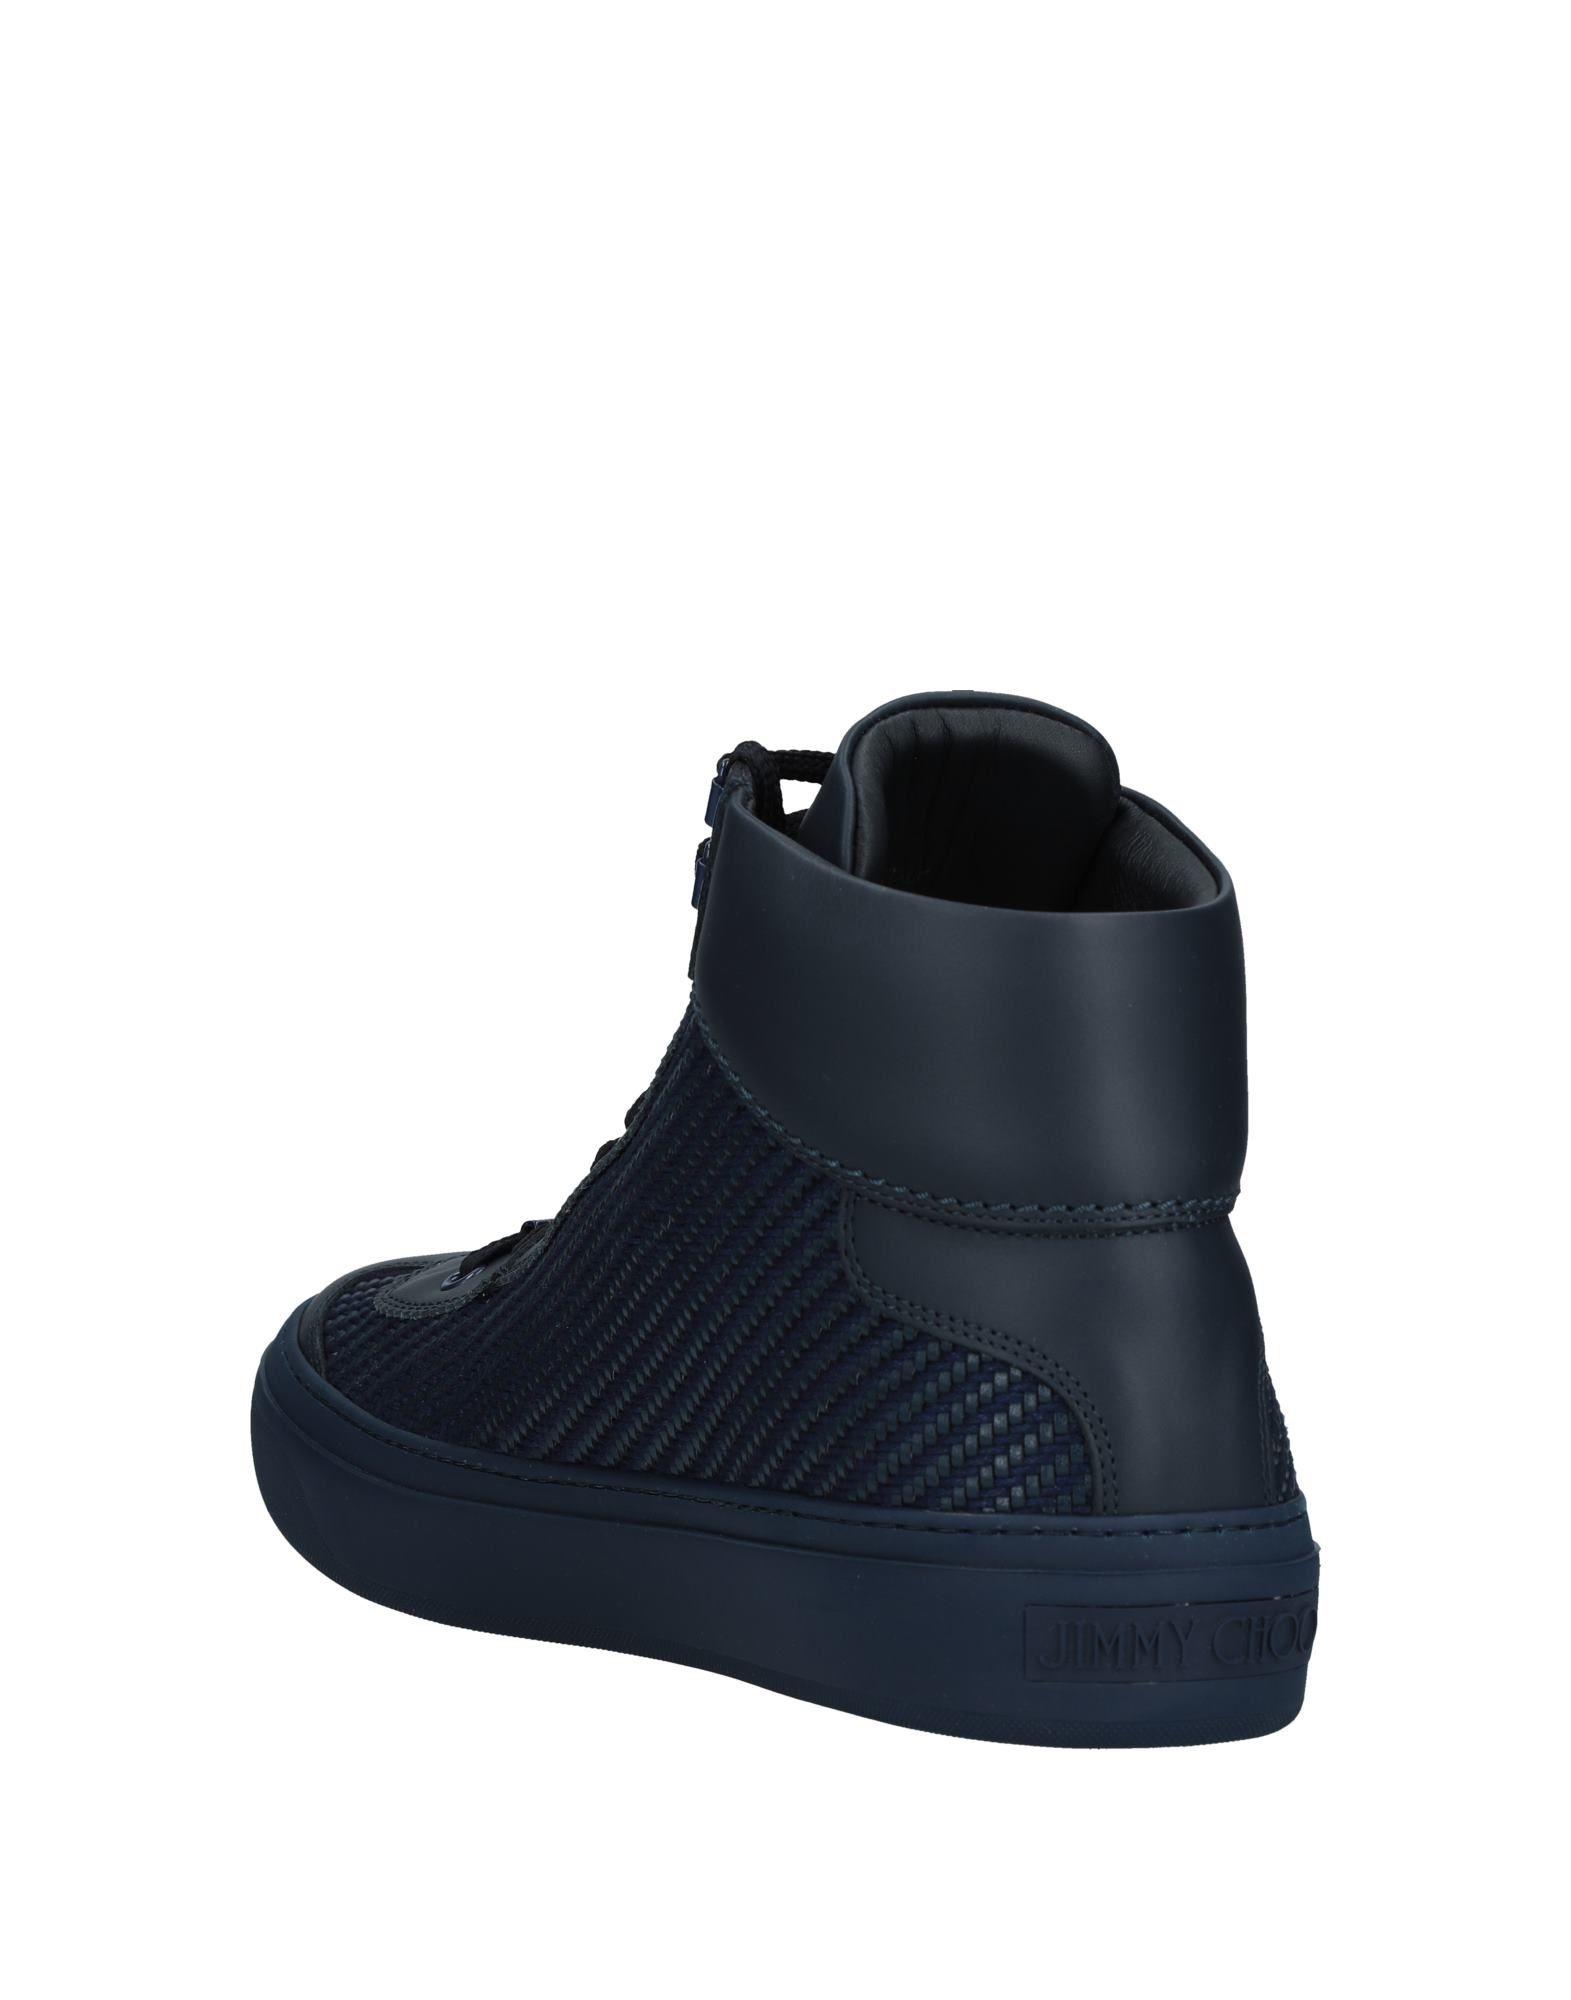 Jimmy Choo Sneakers Herren    11530541IF Neue Schuhe cce28c